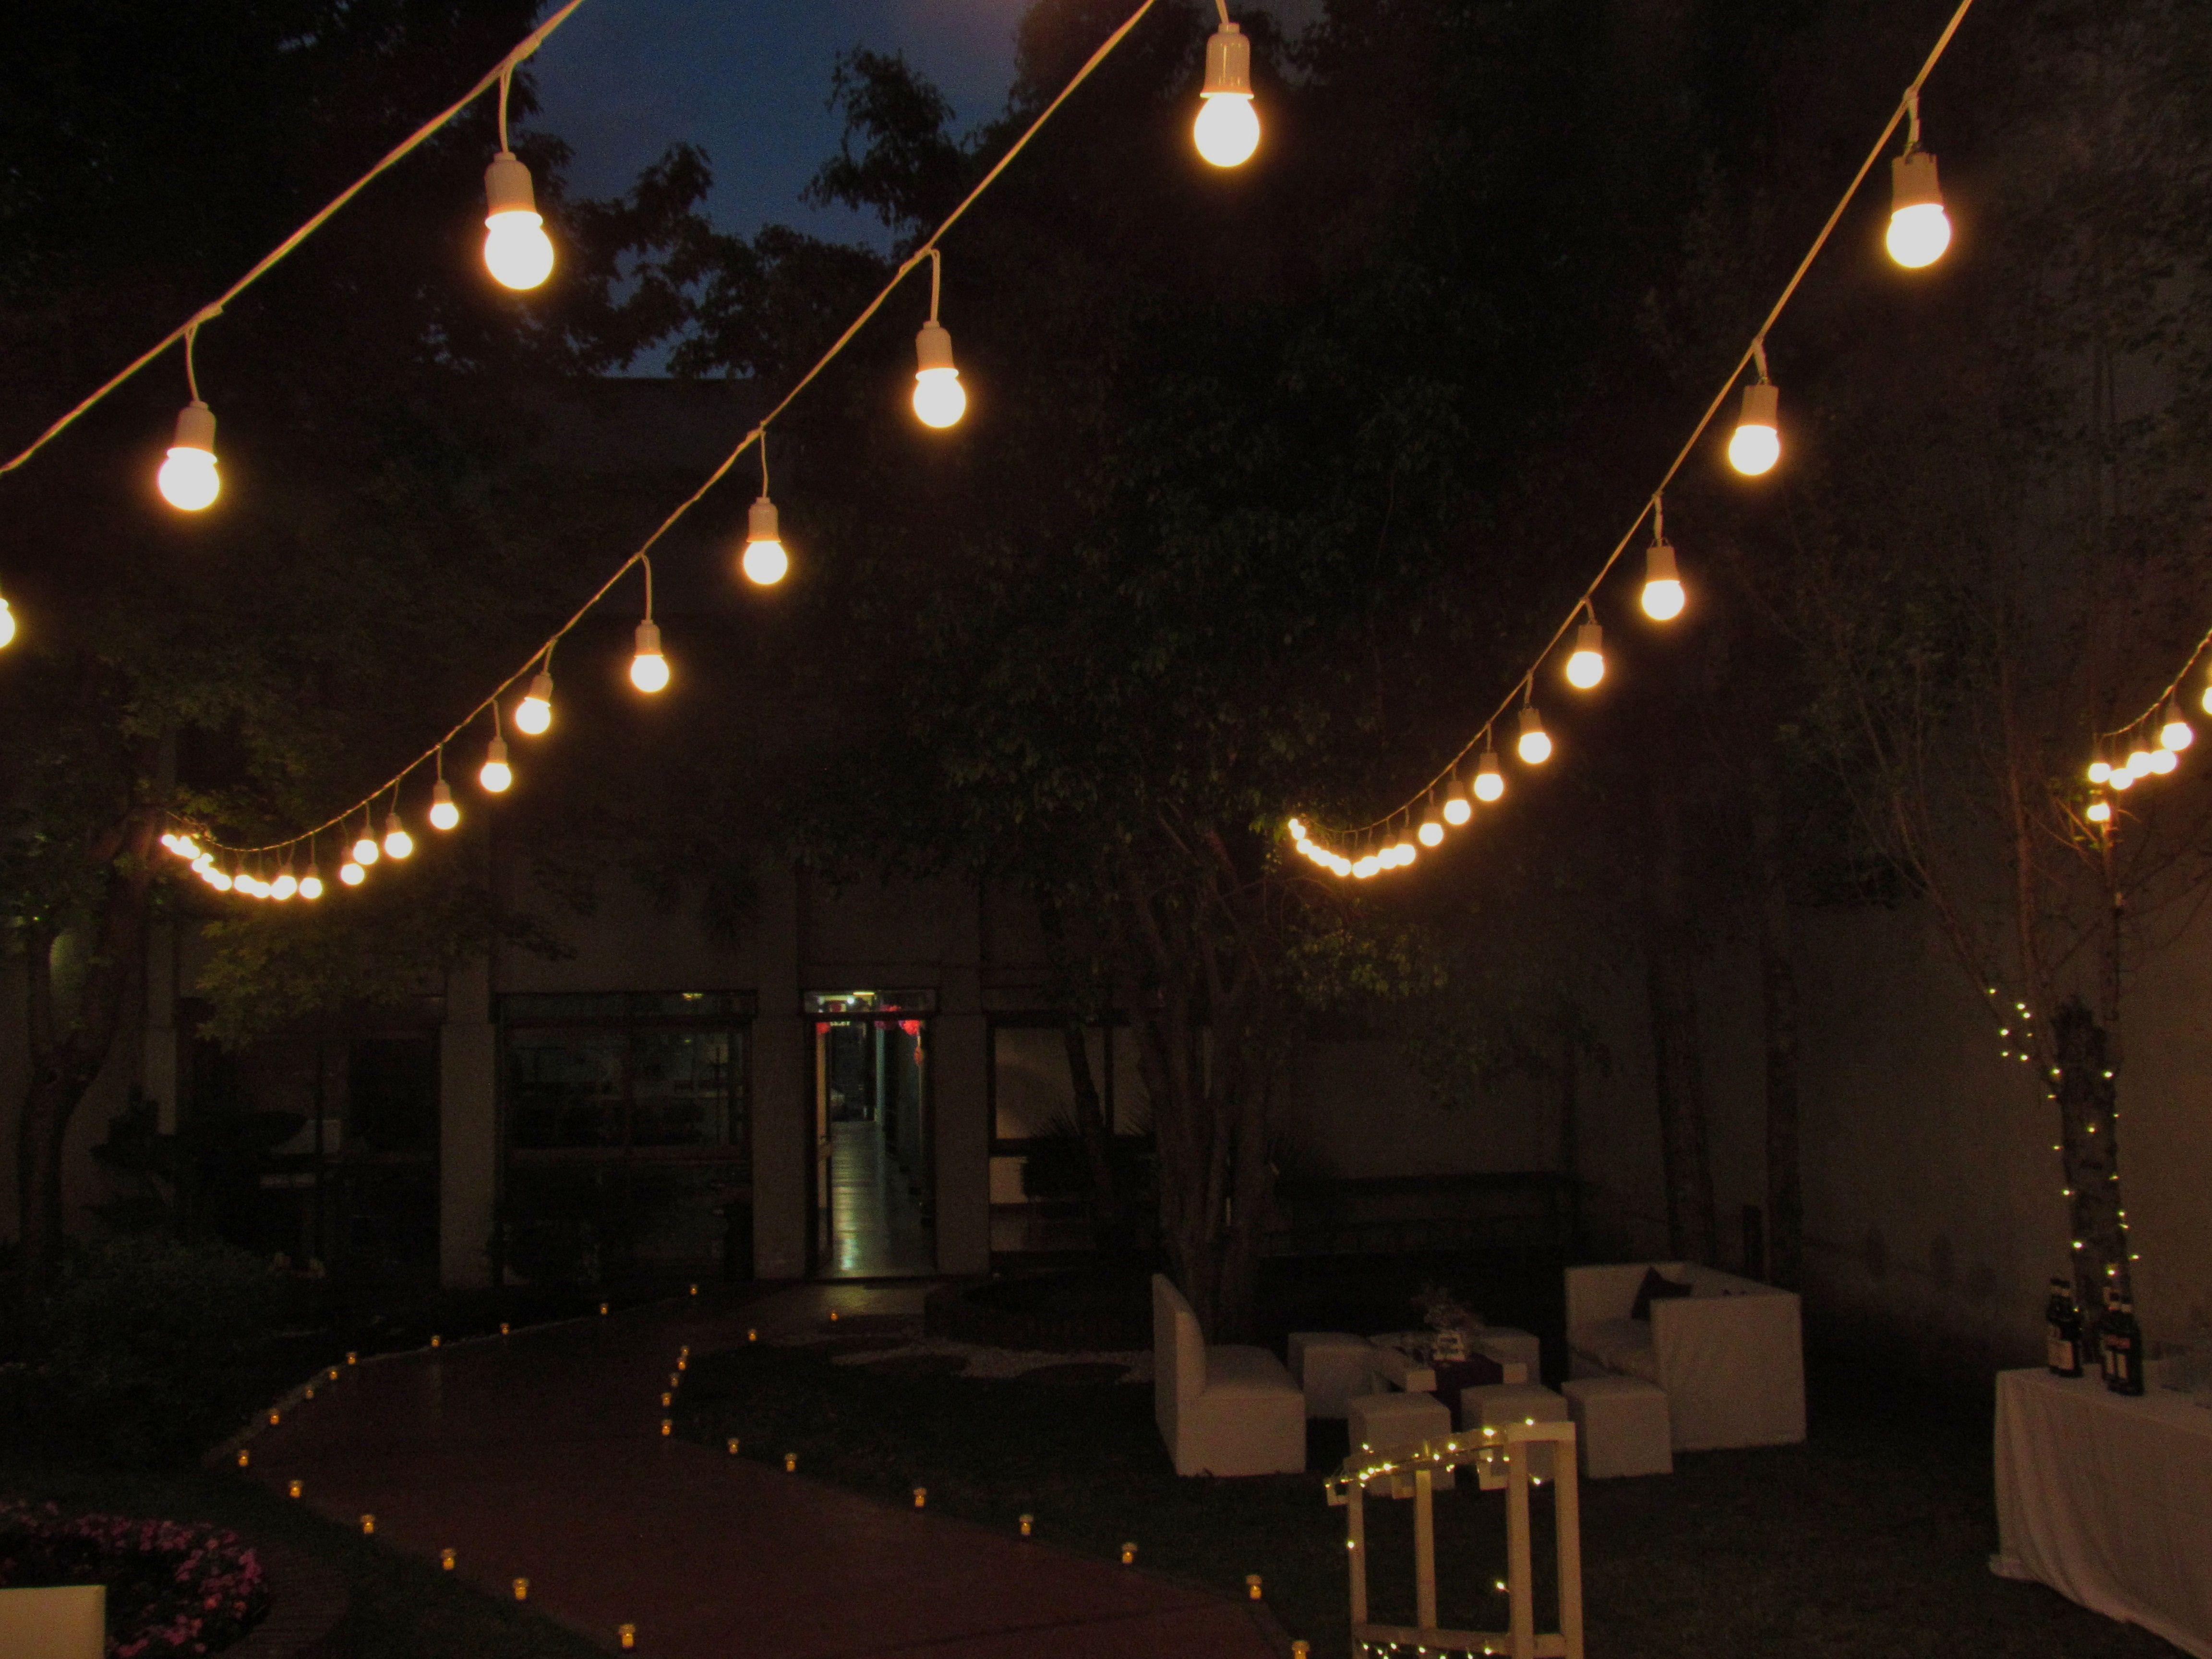 ambientacin exterior con guirnaldas de luces farolitos - Guirnaldas De Luces